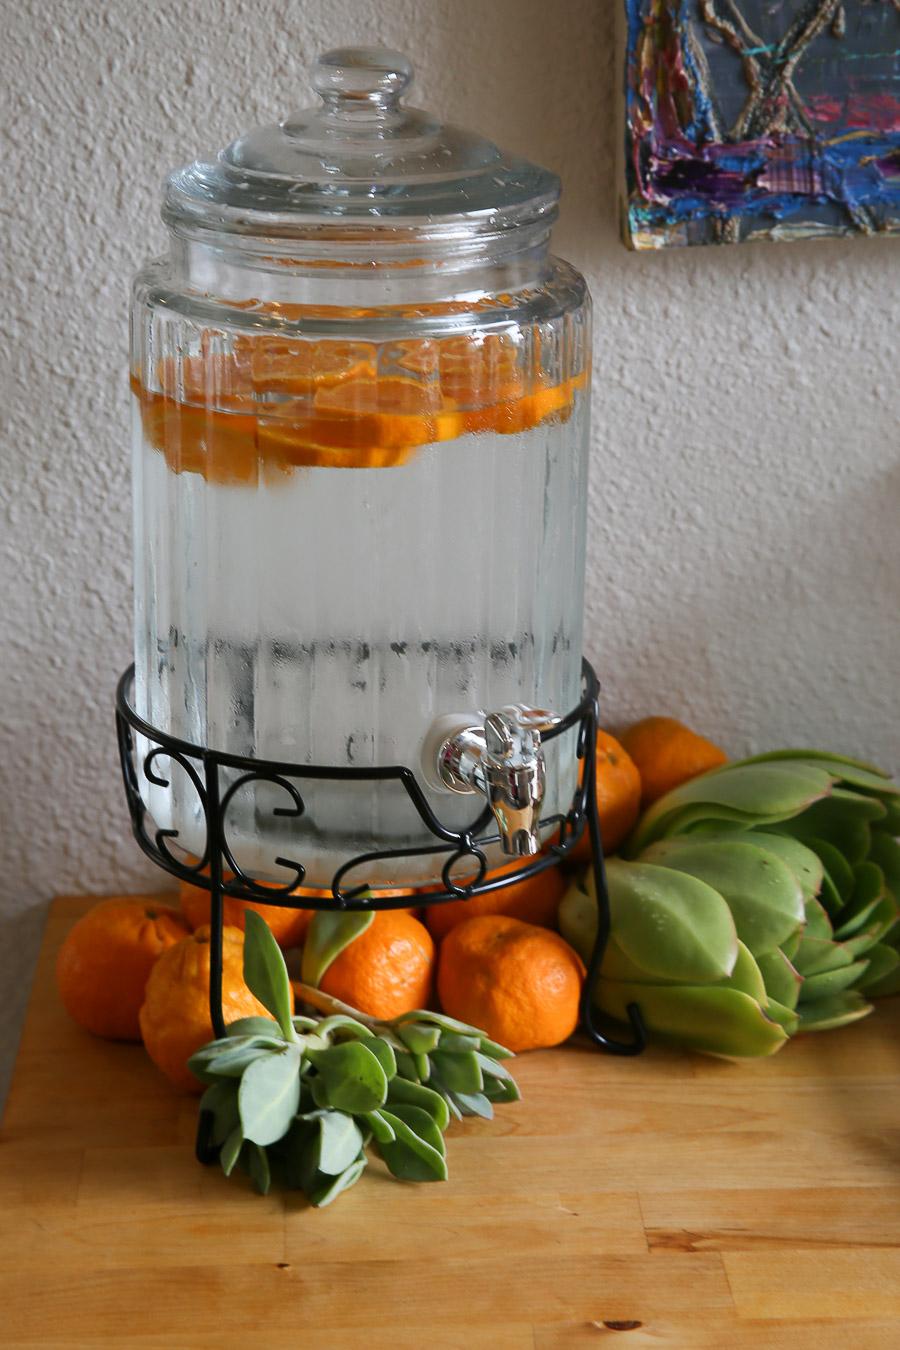 Ojai Pixie Tangerines in Water - Baby Shower Drinks